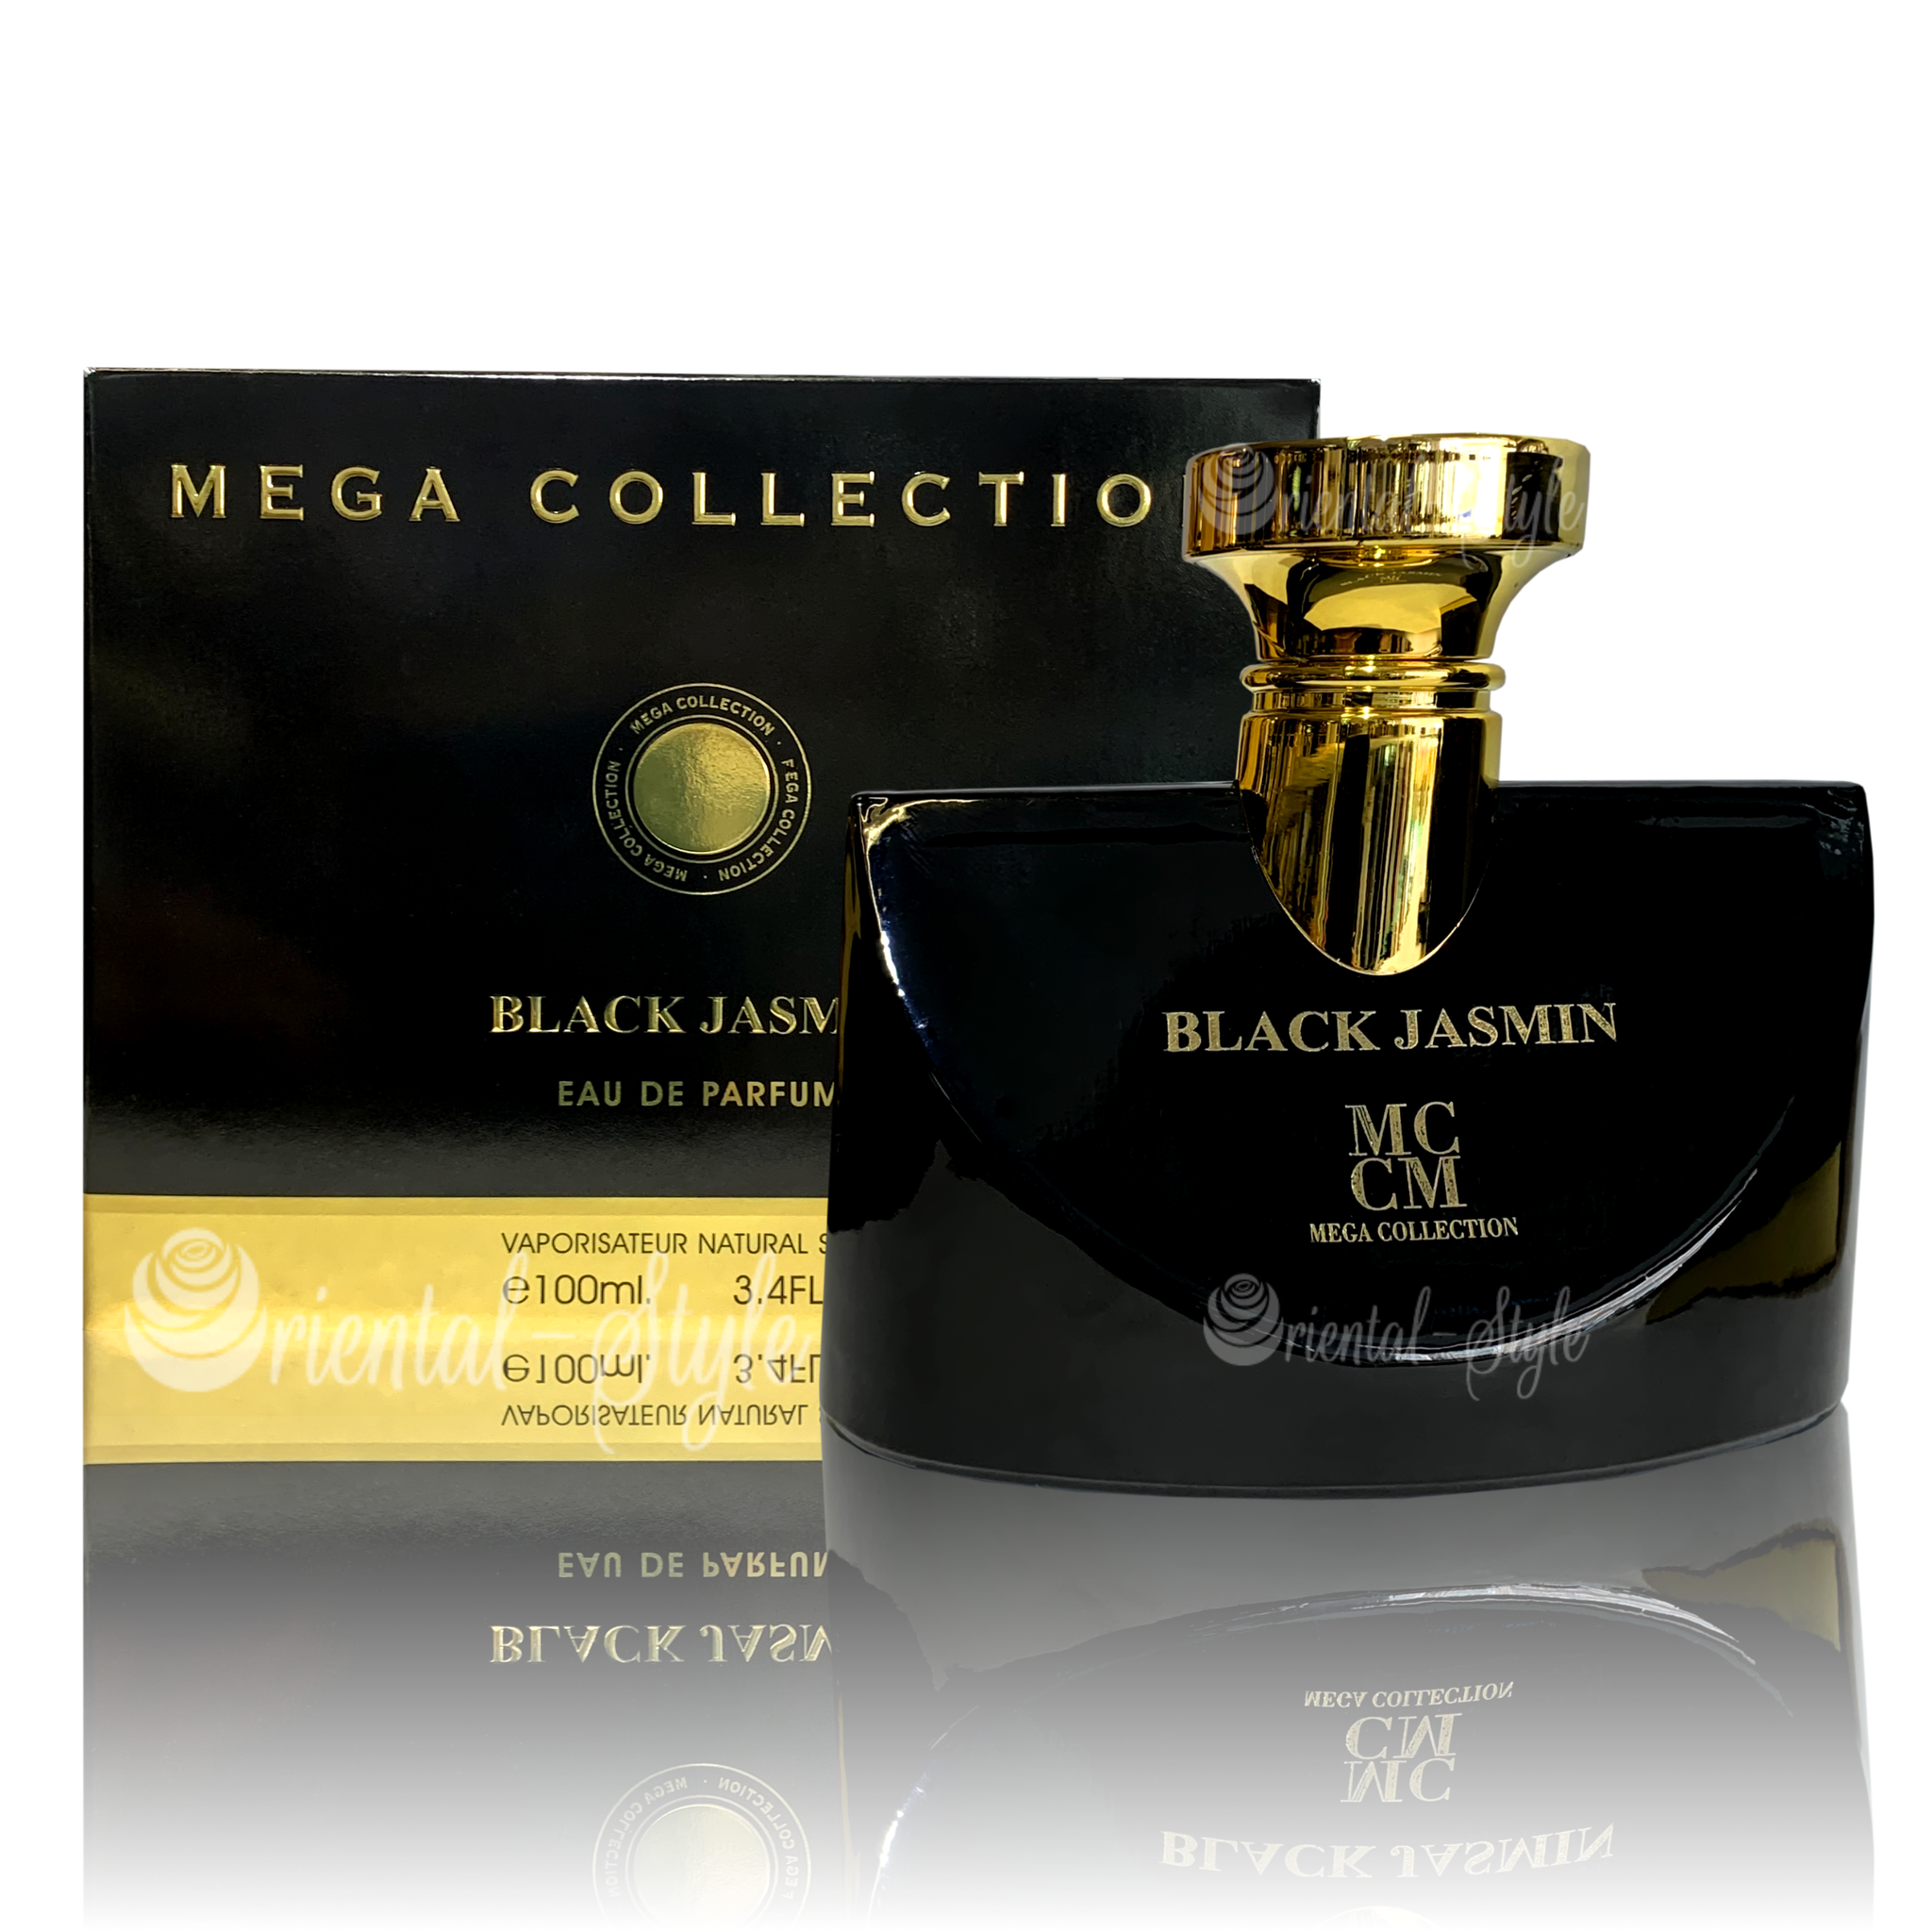 Edp Al De Parfum Jasmin Black Ard Eau F1c3ljtk Zaafaran PkuOXZTi